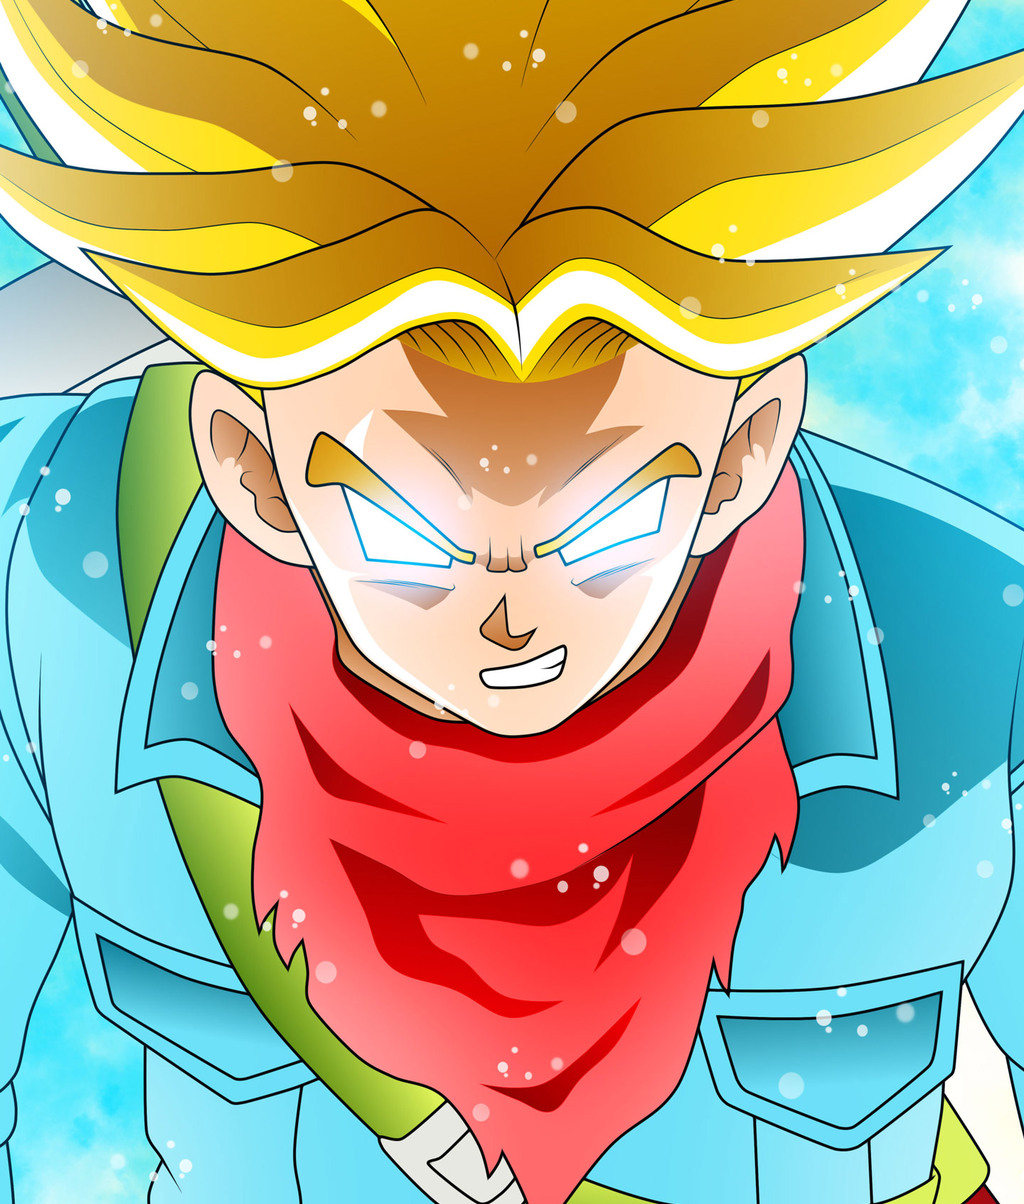 Dragon Ball Super Wallpaper Android Hd: 1024x1204 Trunks Dragon Ball Super 1024x1204 Resolution HD